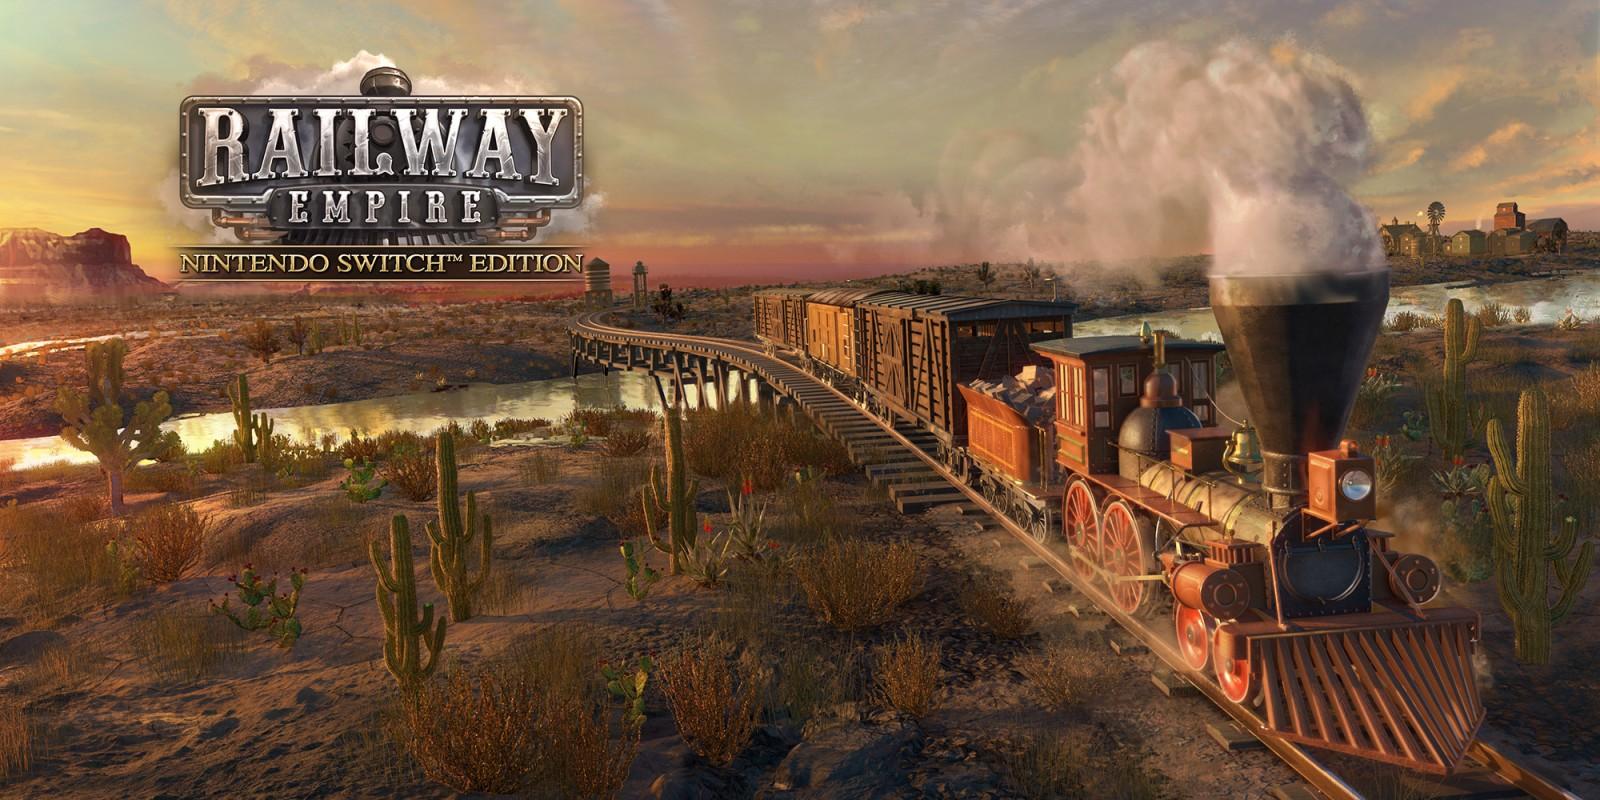 Railway Empire Nintendo Switch Review